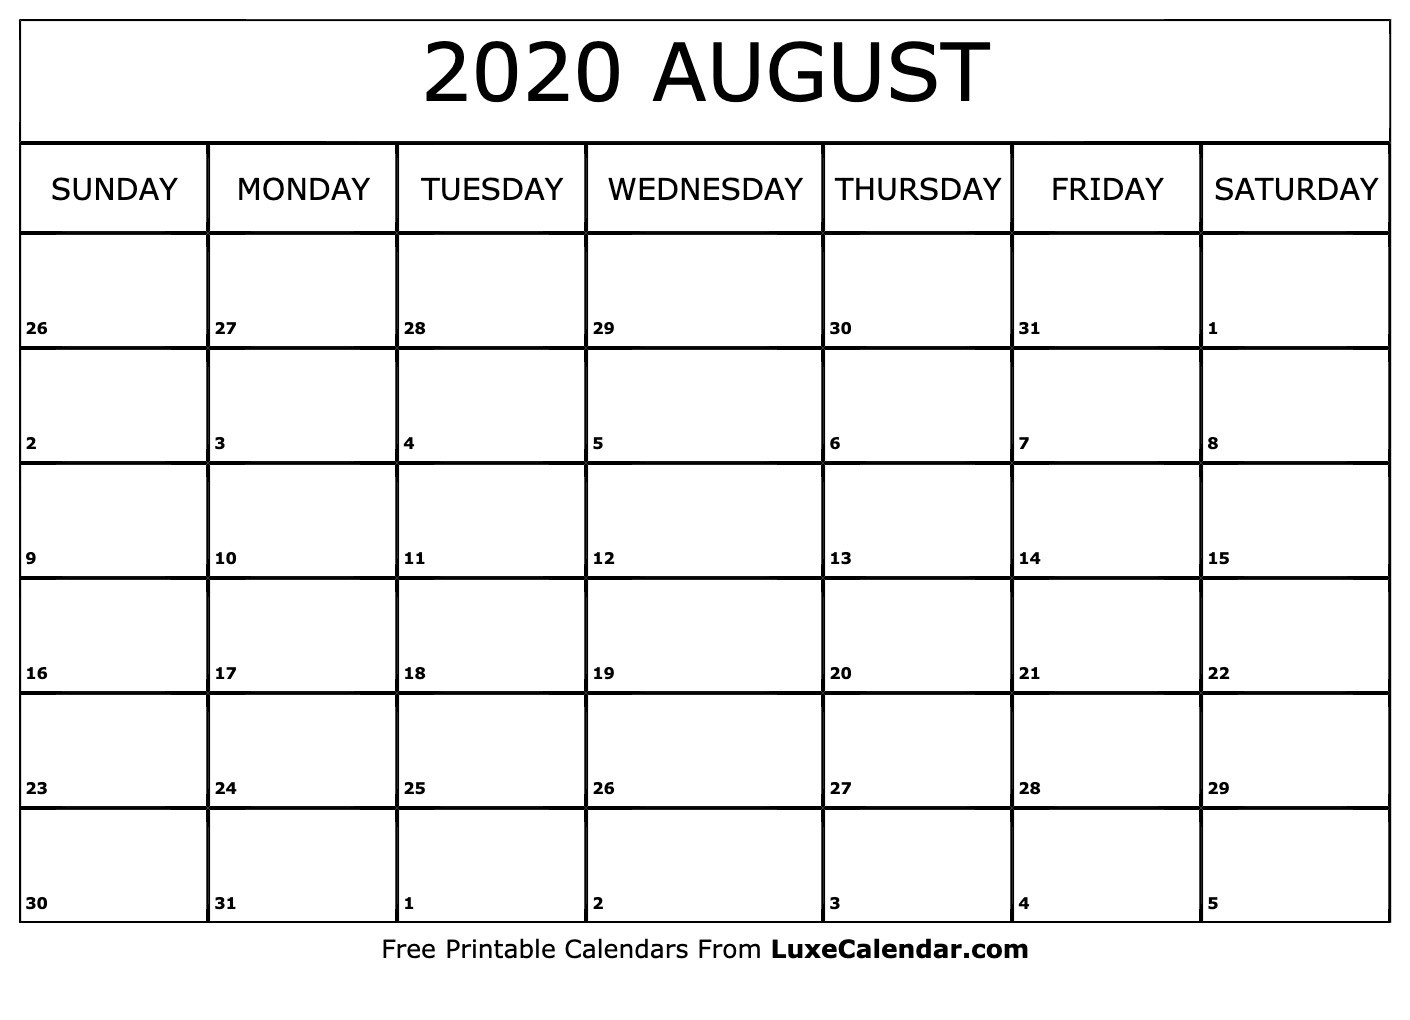 Blank August 2020 Calendar Printable - Luxe Calendar-Luxe Calendar Aug 2020 Blank Printable